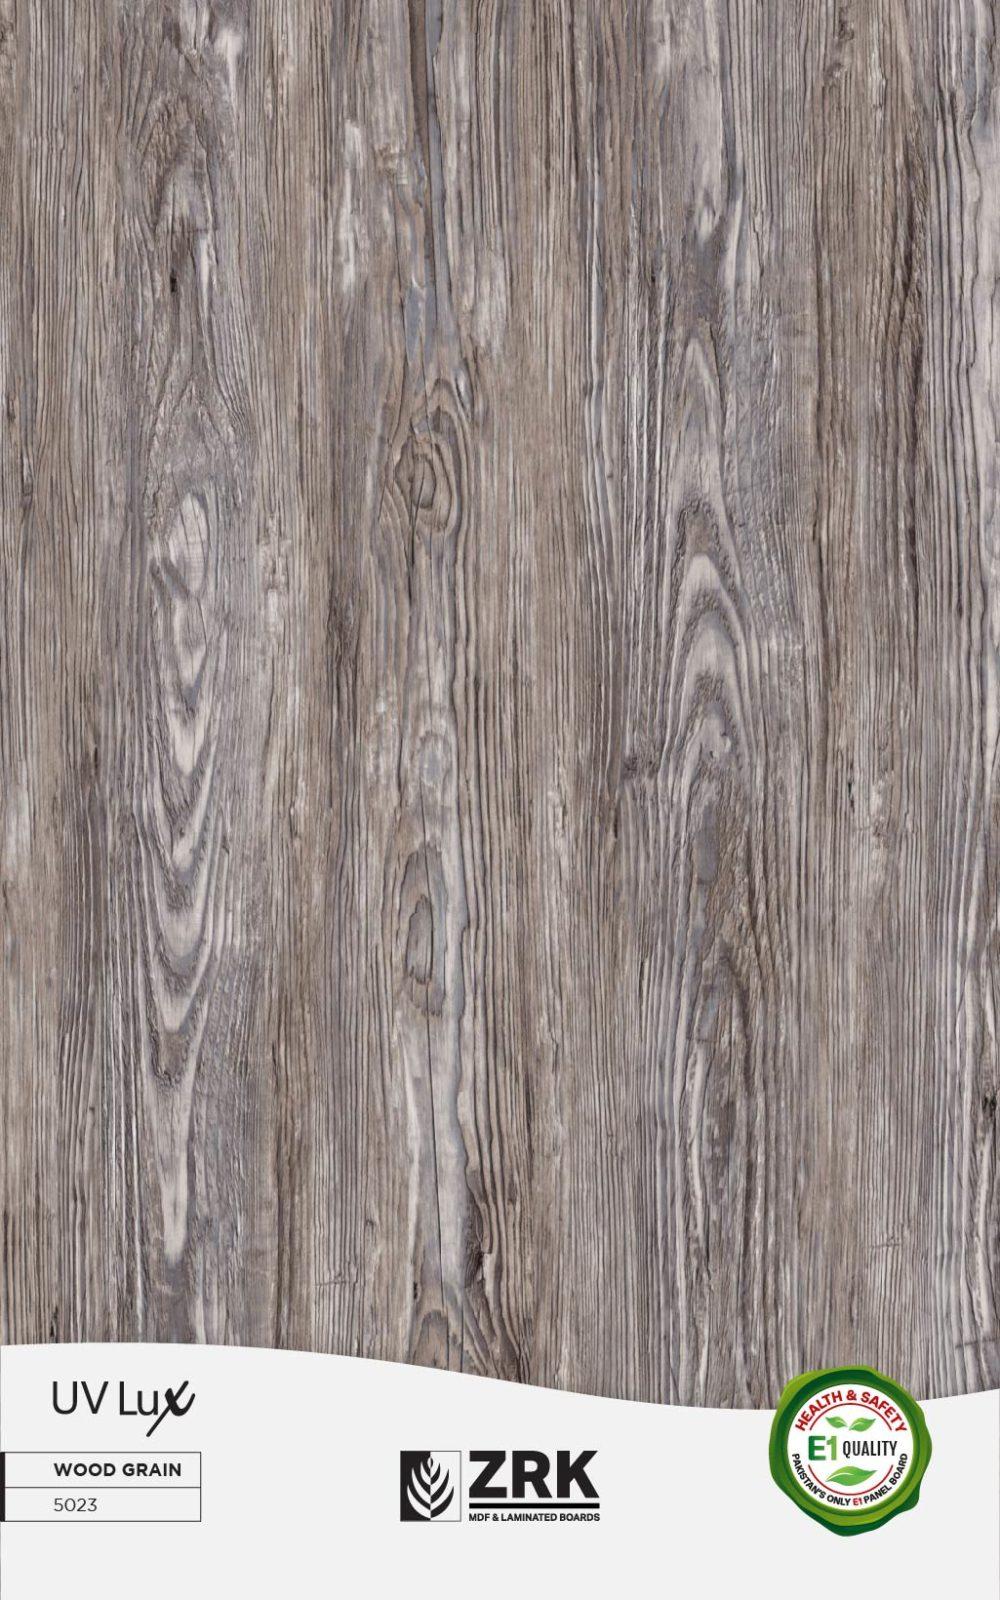 UV LUX - Wood Grain - 5023